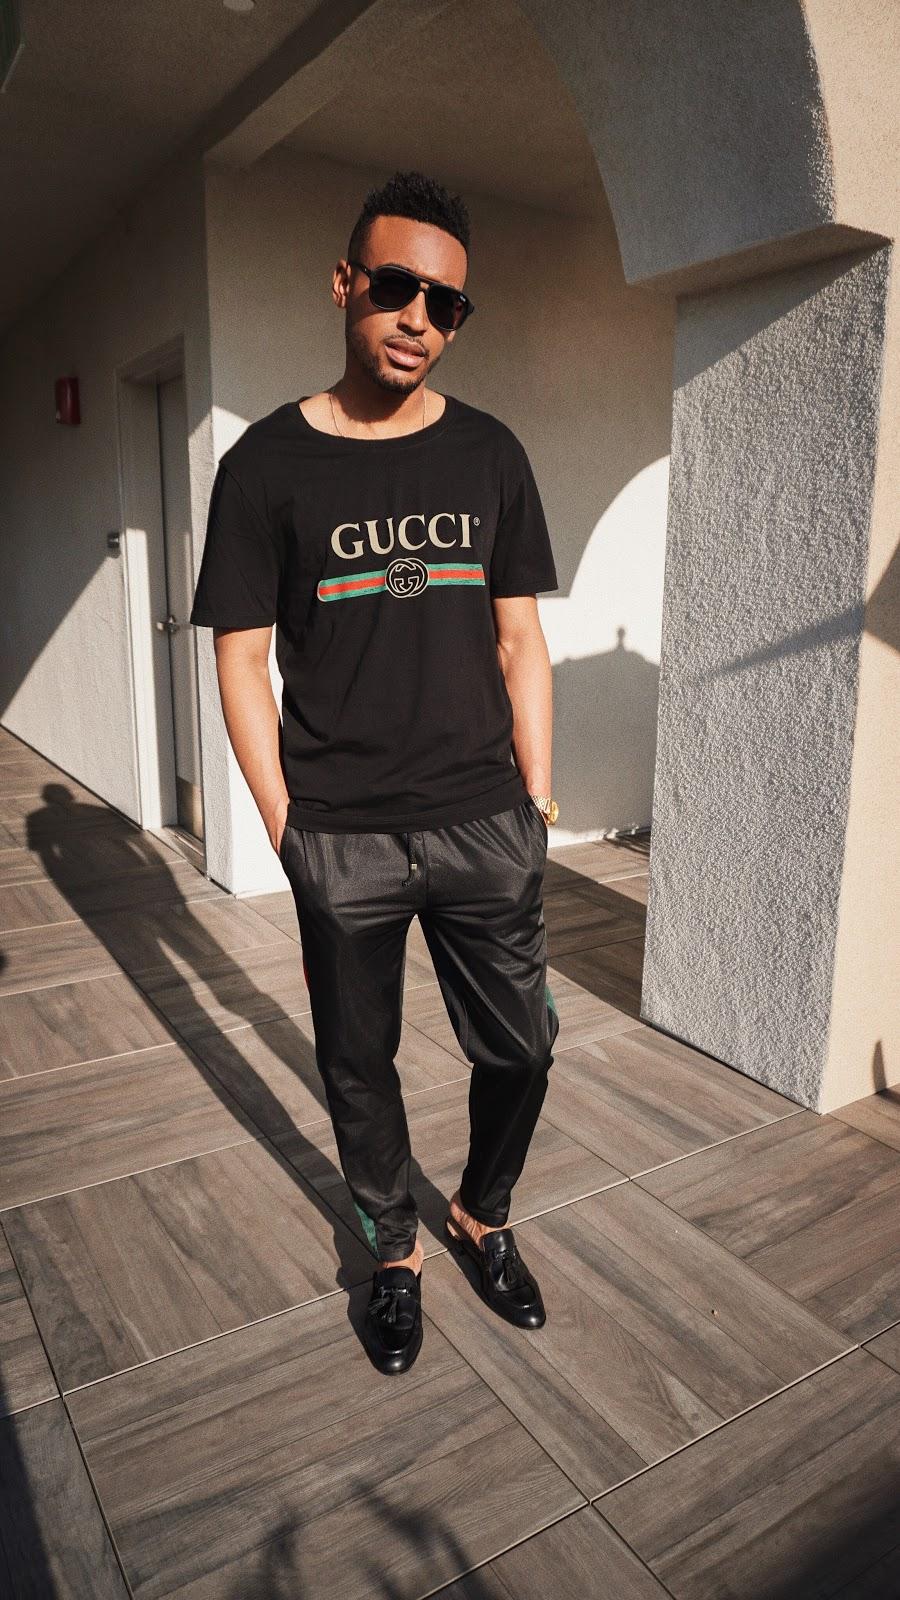 gucci tshirt mens gucci tshirt mr.porter gucci tee gucci logo t-shirt